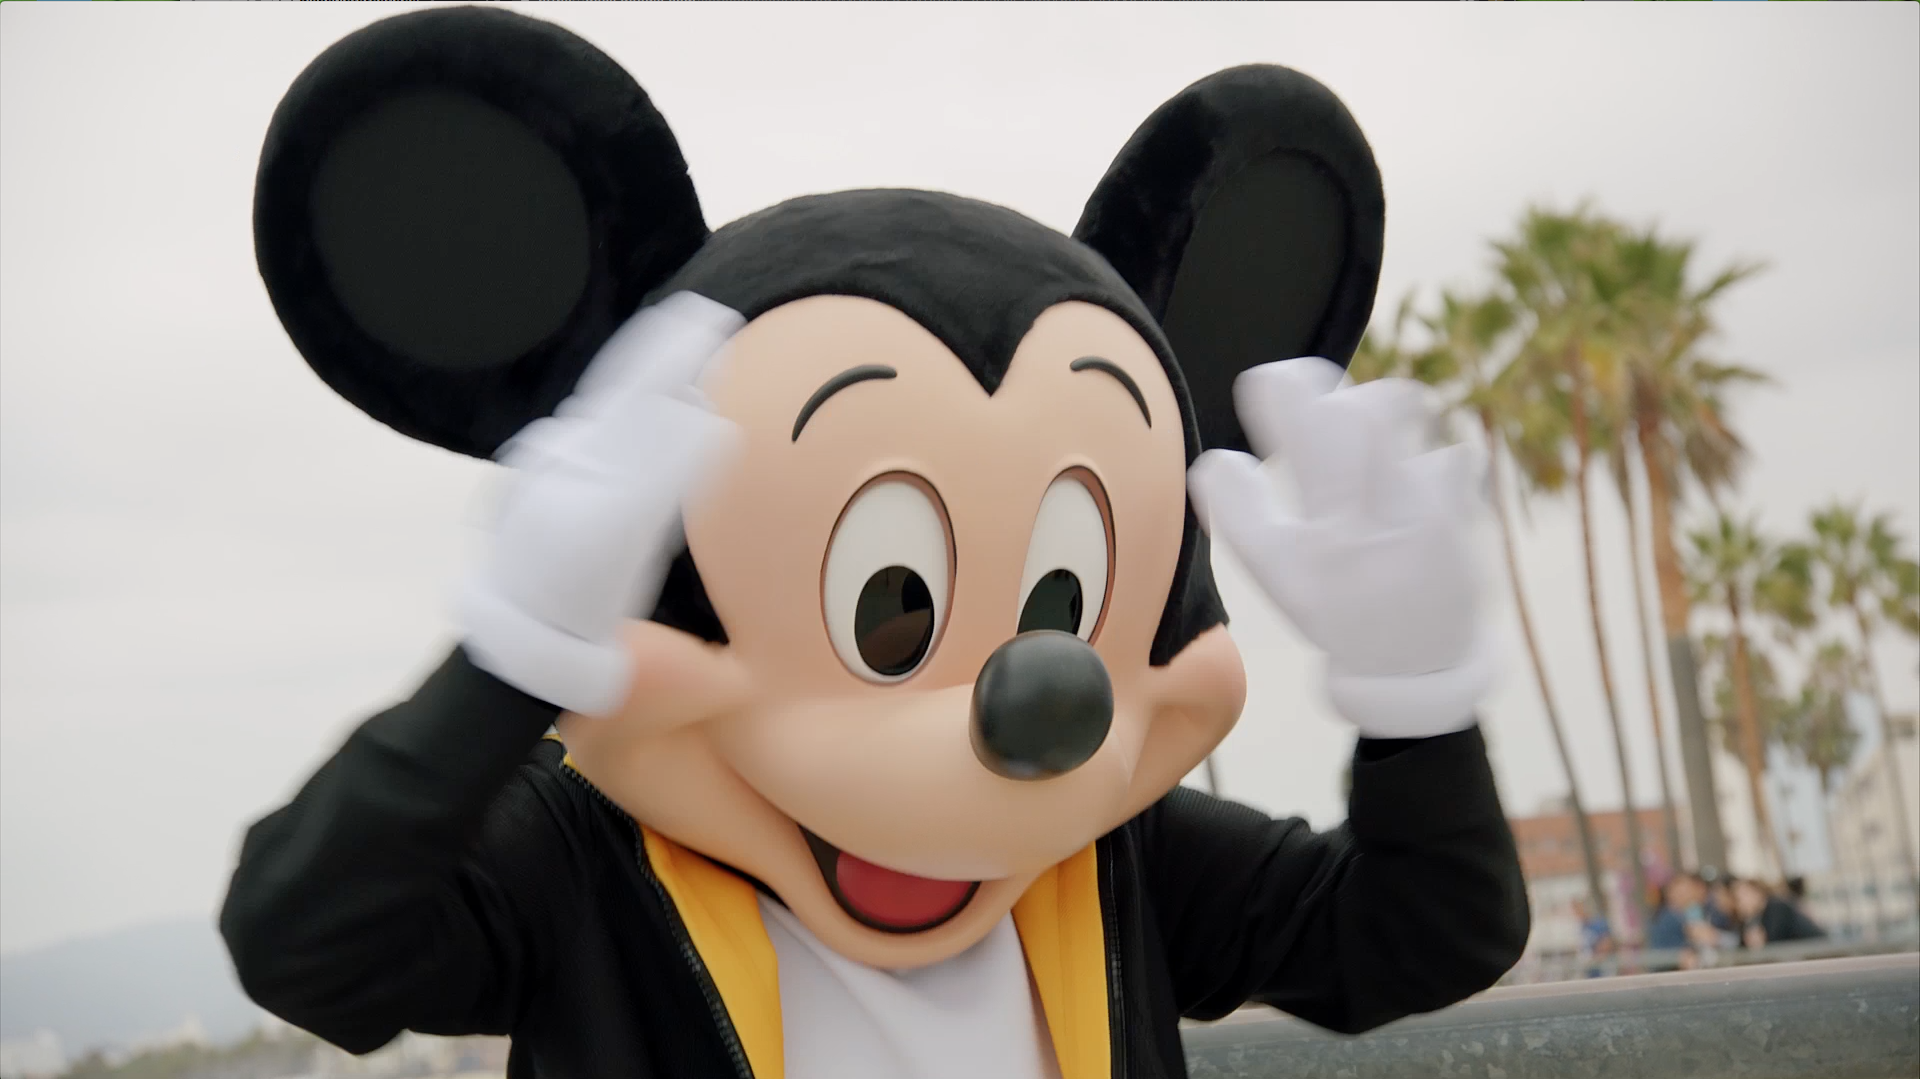 Feliz niver, Mickey!